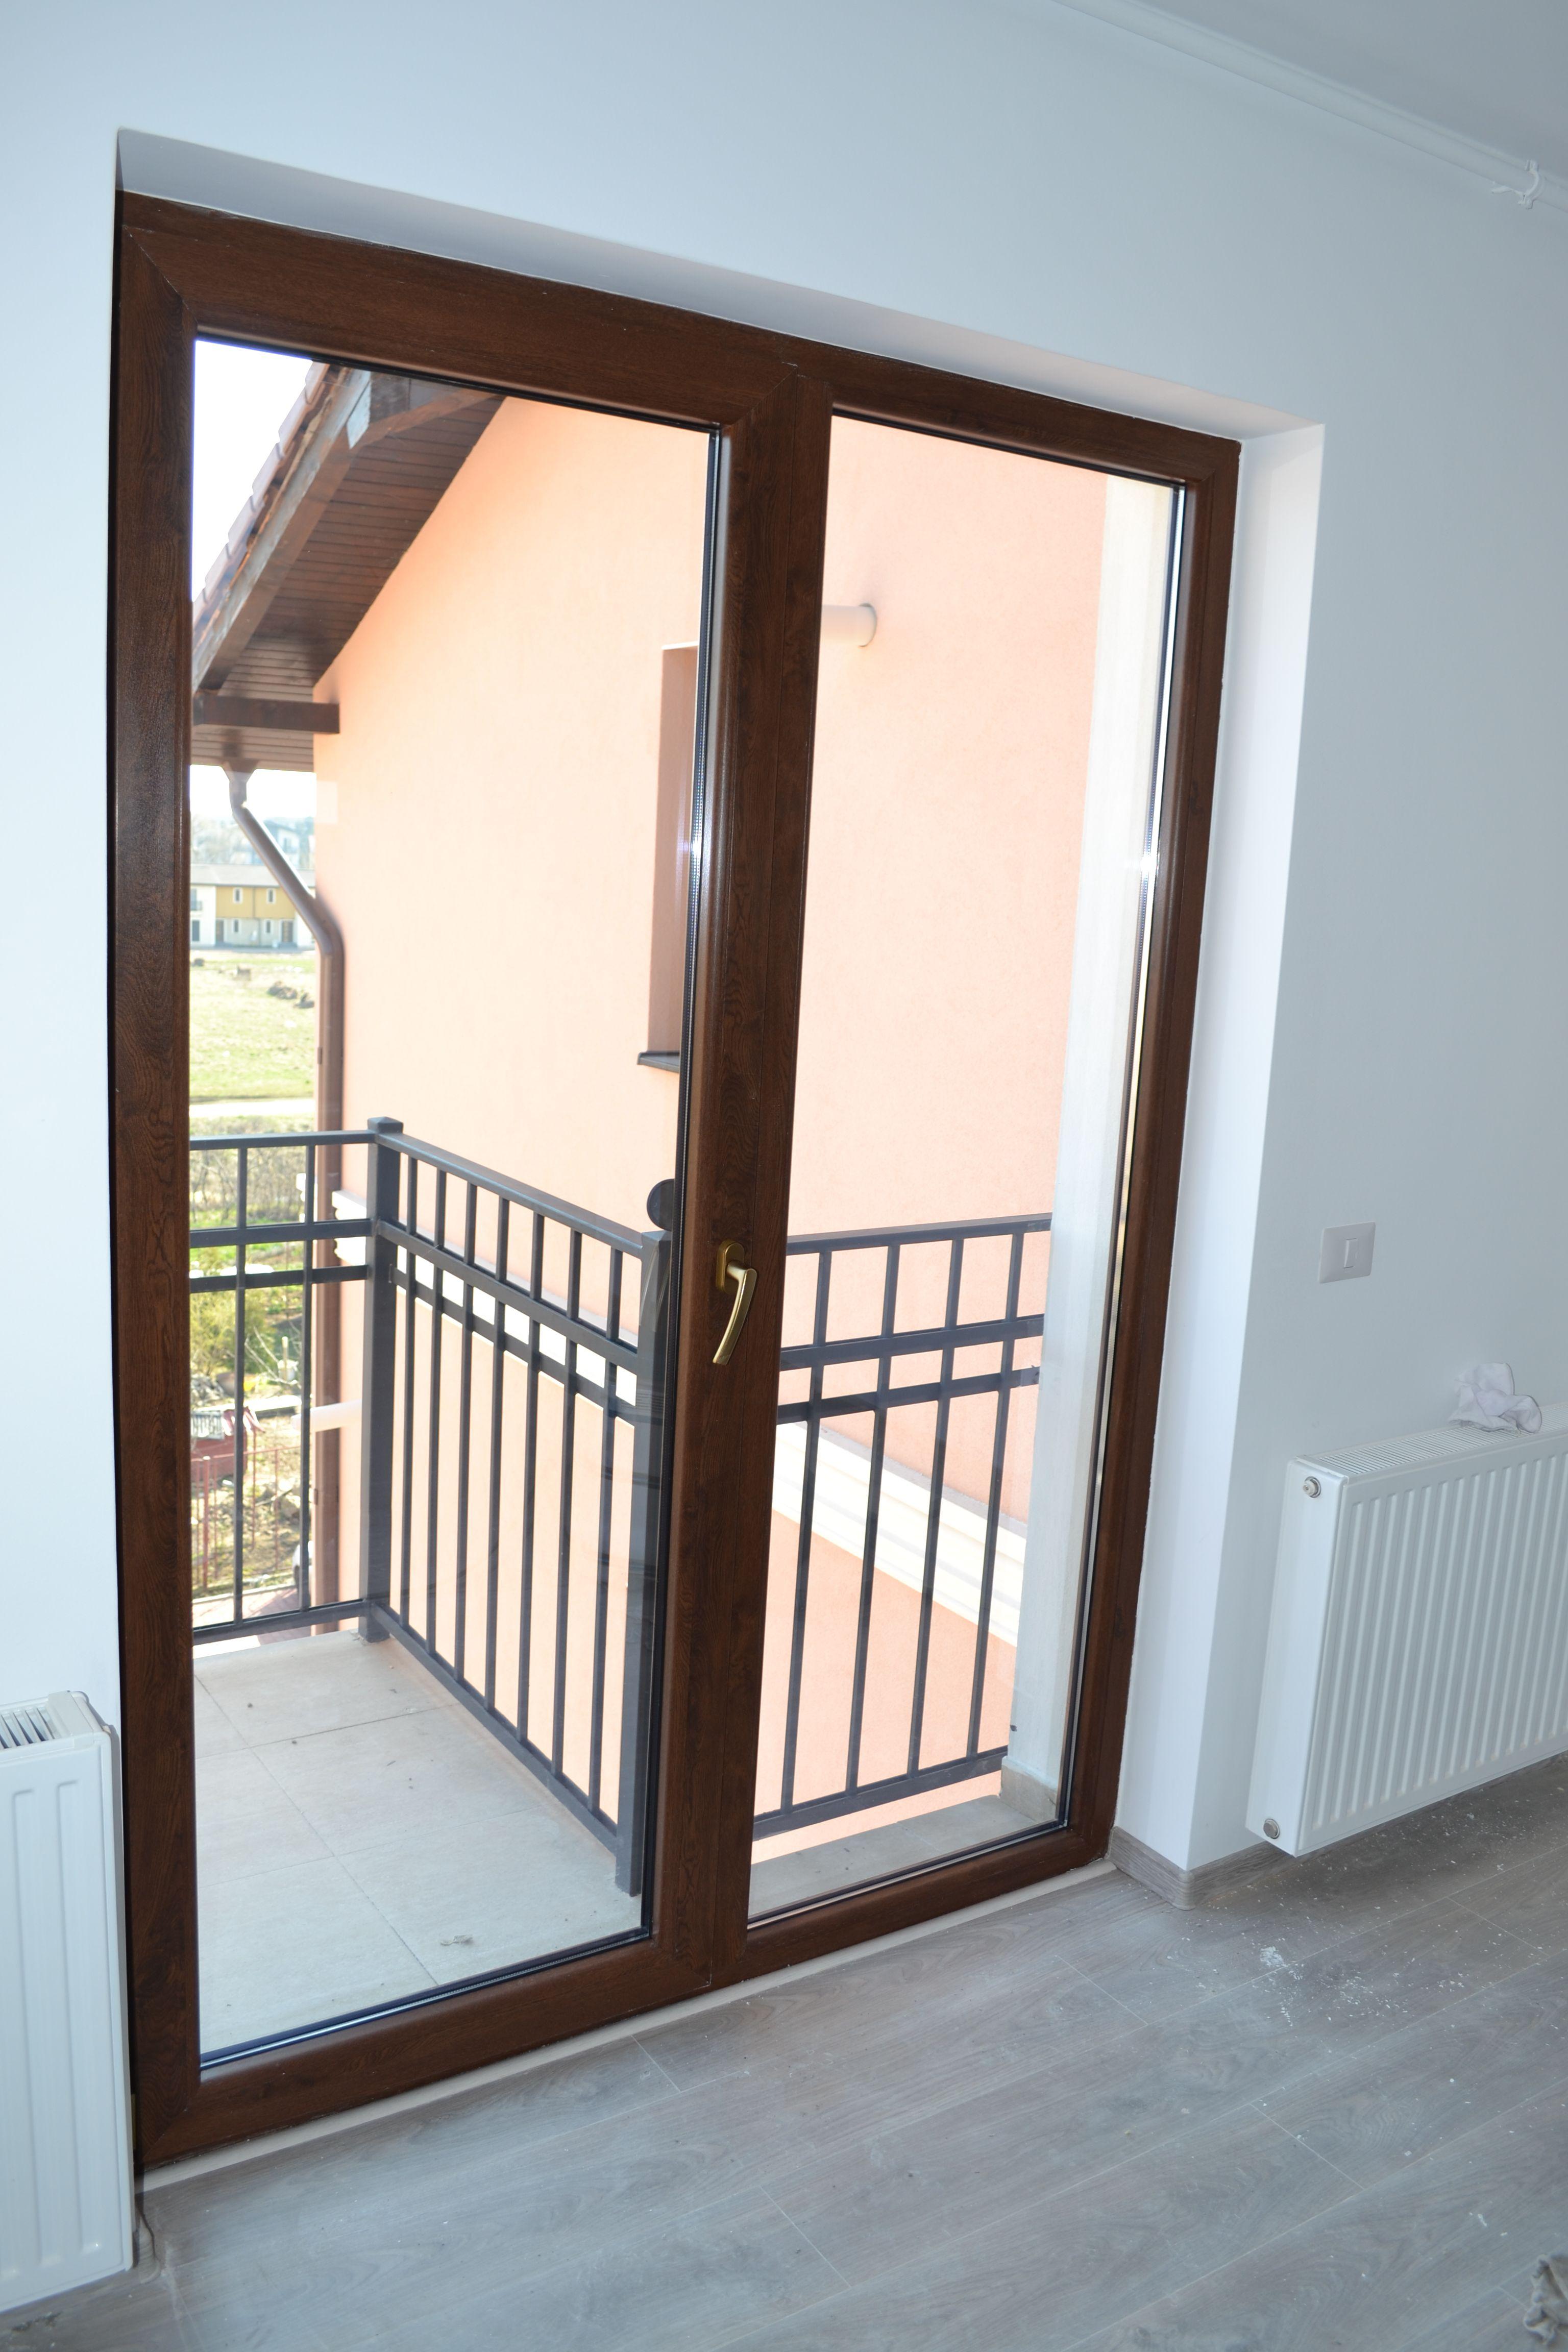 Tarif spalat geamuri - Adamaro Clean Timisoara